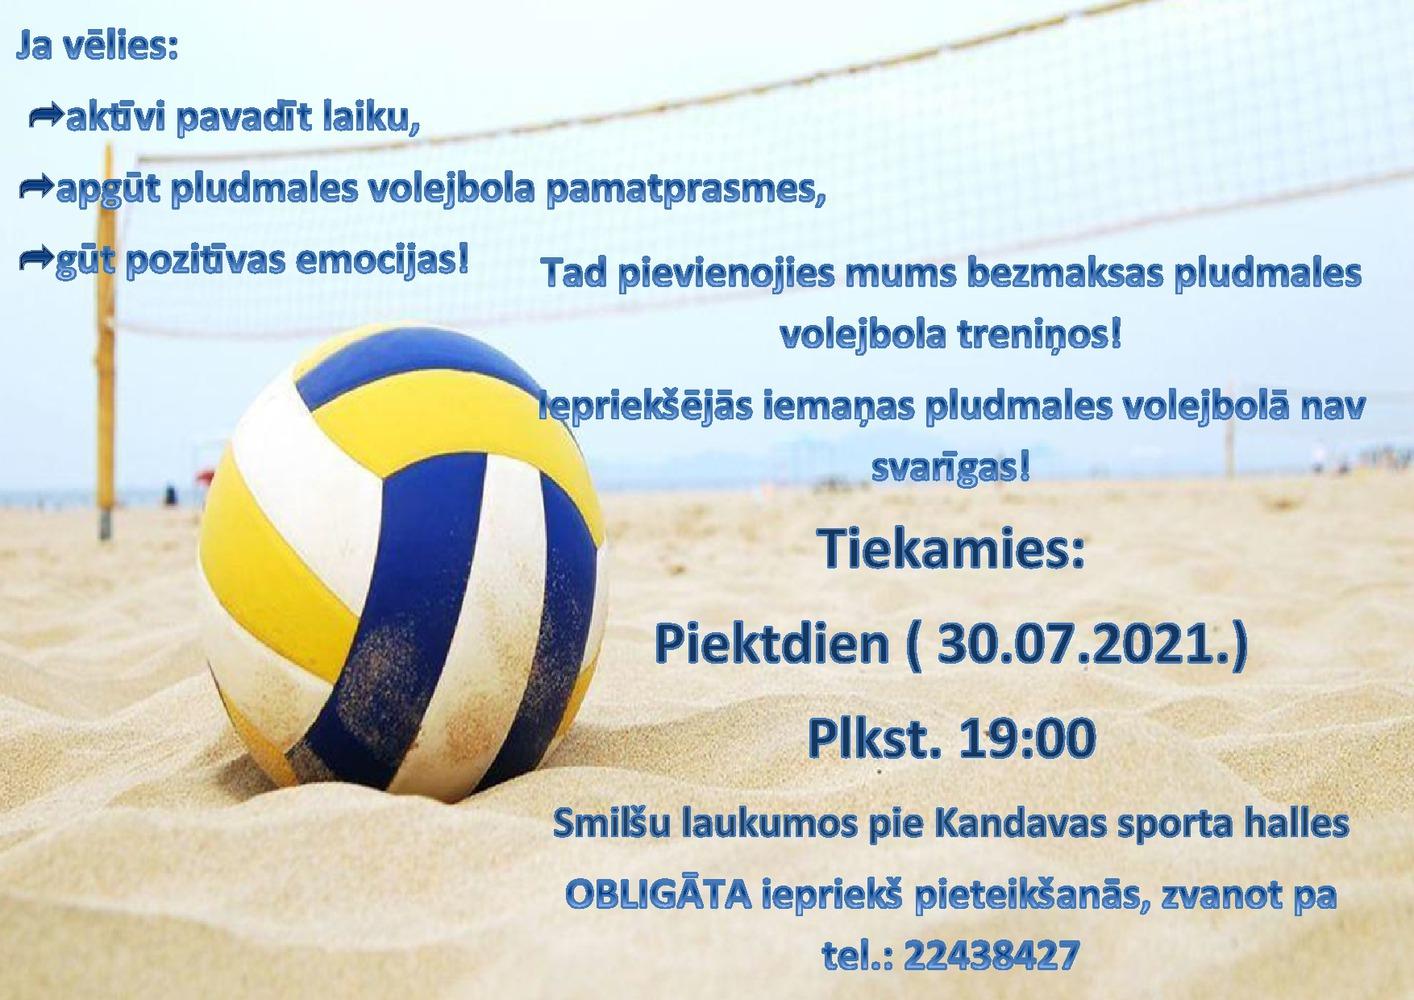 volejbola_treninu_afisa_page0001_1.jpg